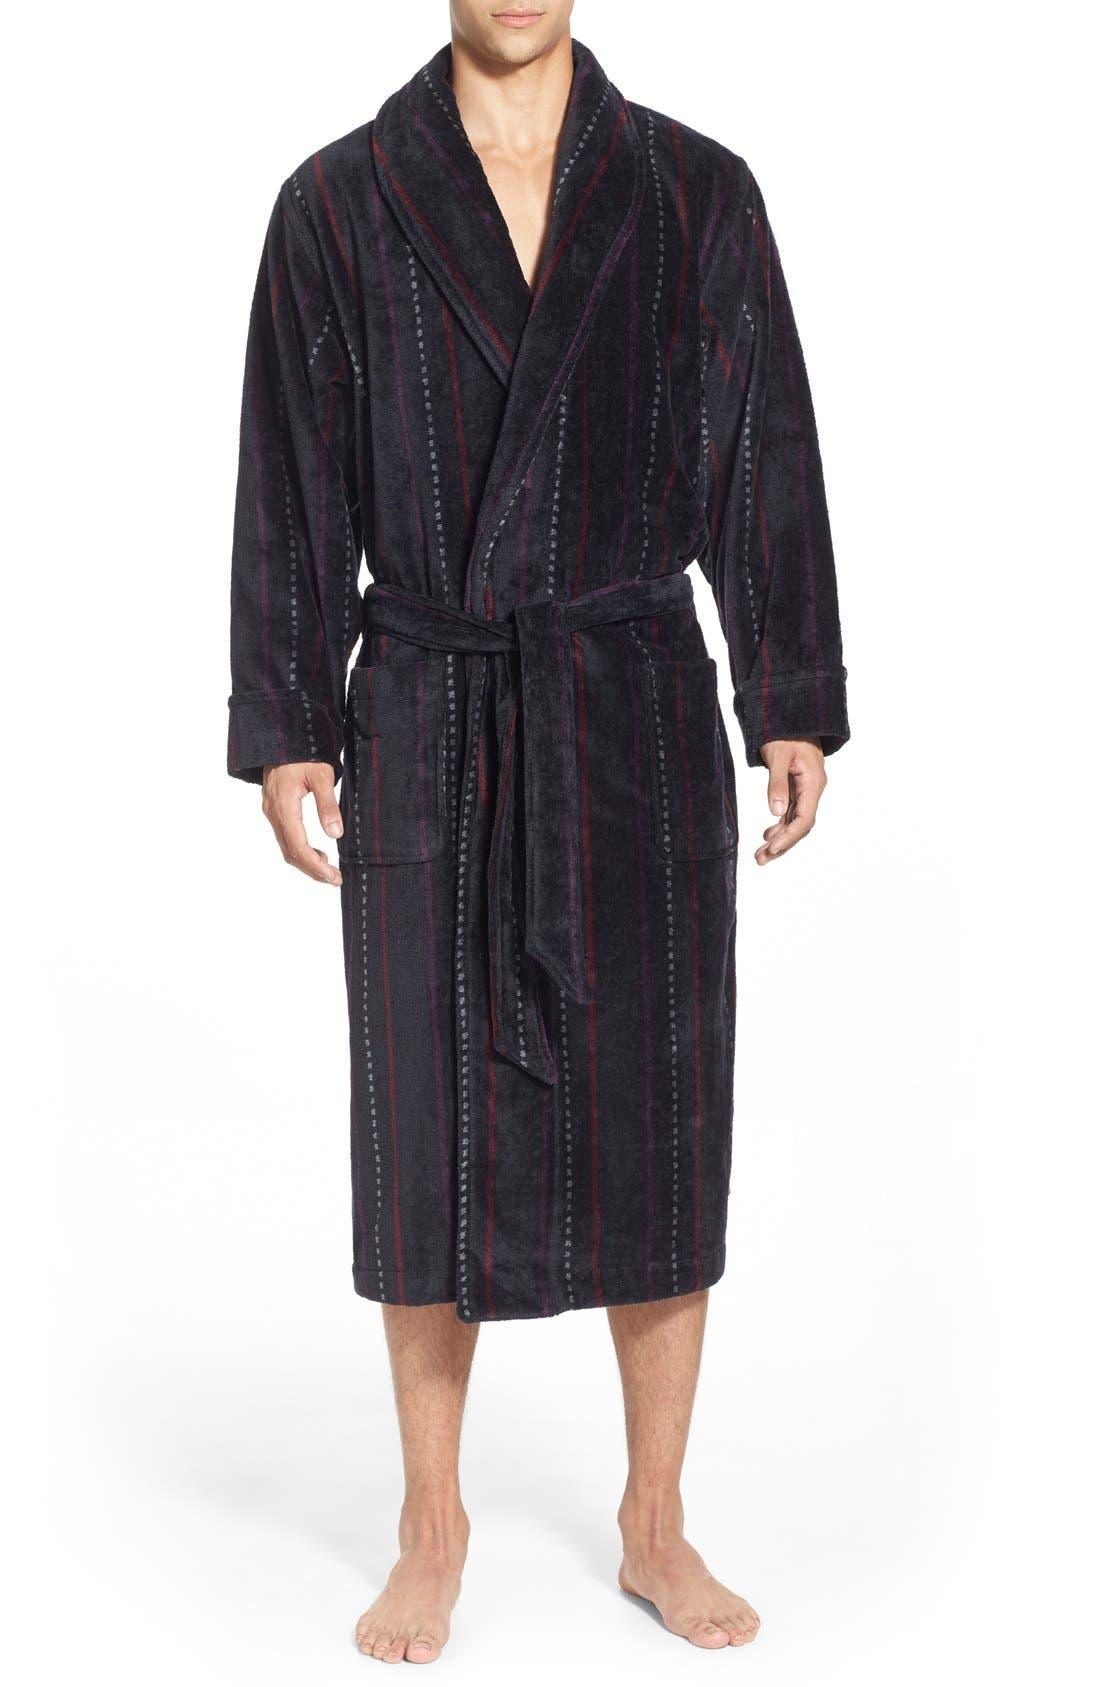 Main Image - Nordstrom Men's Shop Terry Shawl Robe